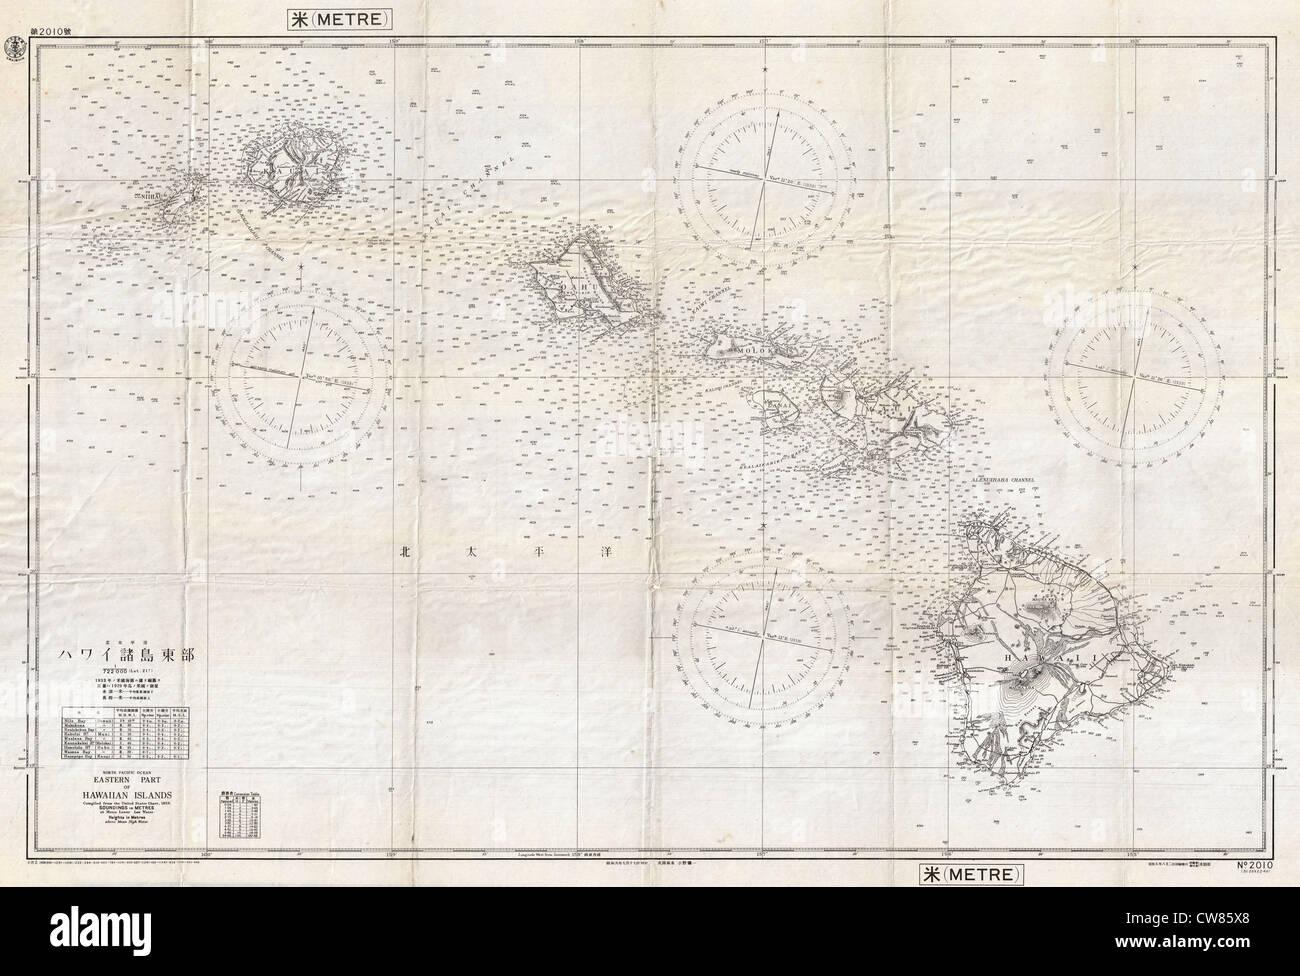 1939 Japanese World War II Chart or Map of Hawaii - Stock Image